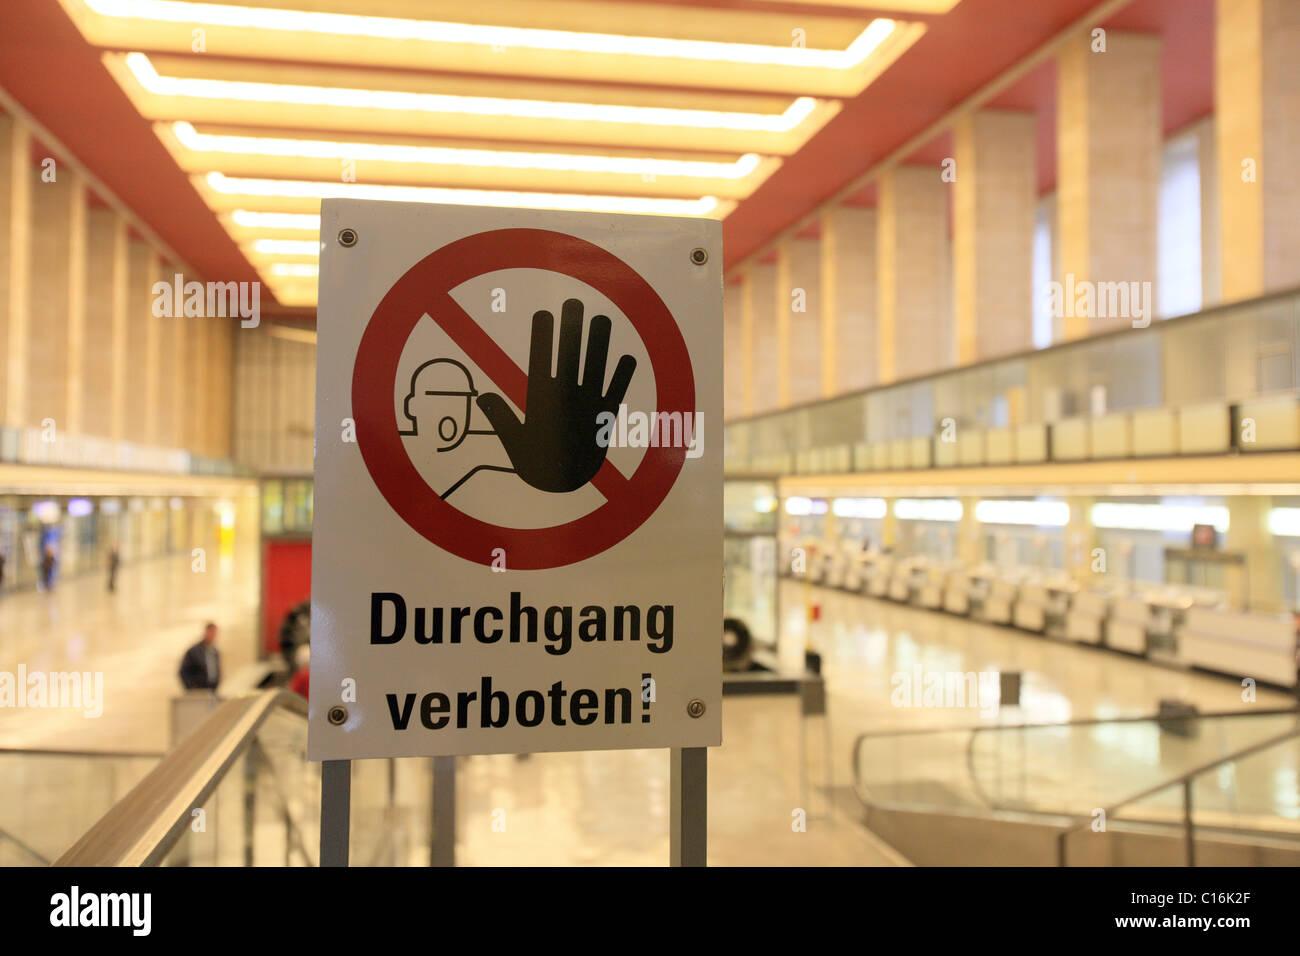 No thoroughfare sign at Berlin Tempelhof Airport, Berlin, Germany, Europe - Stock Image